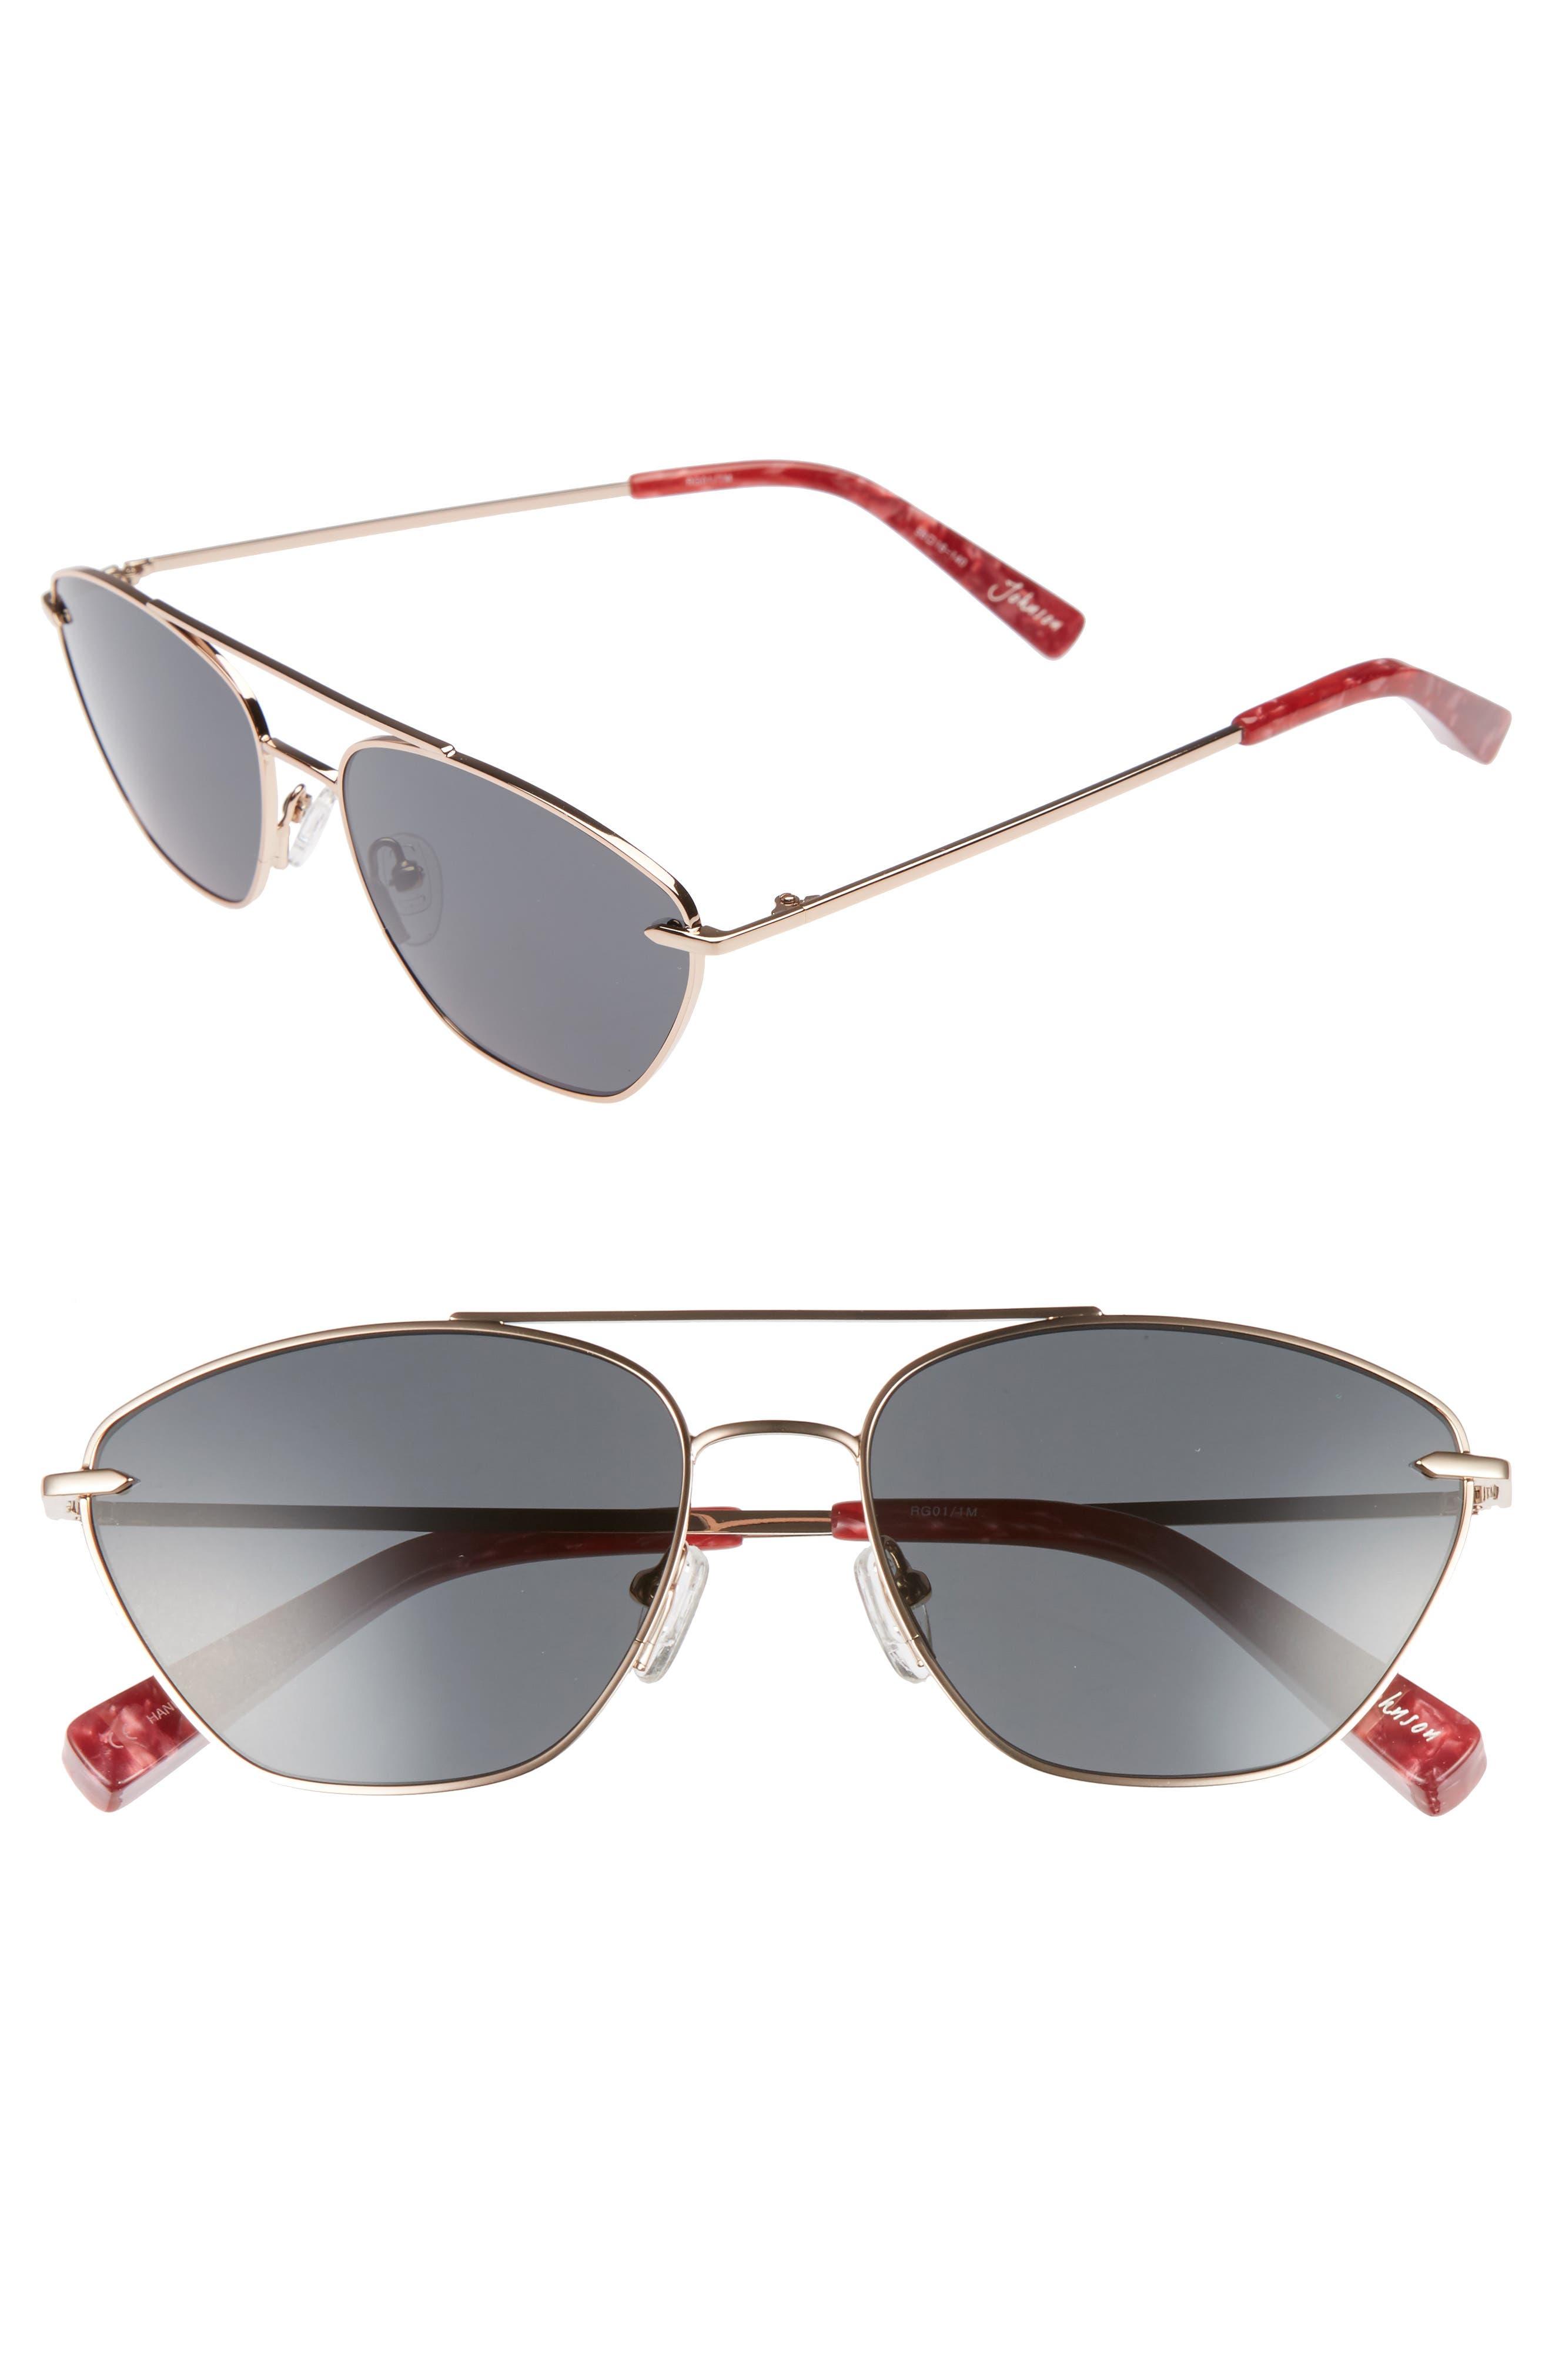 Johnson 56mm Navigator Sunglasses,                         Main,                         color, Rose Gold/ Smoke